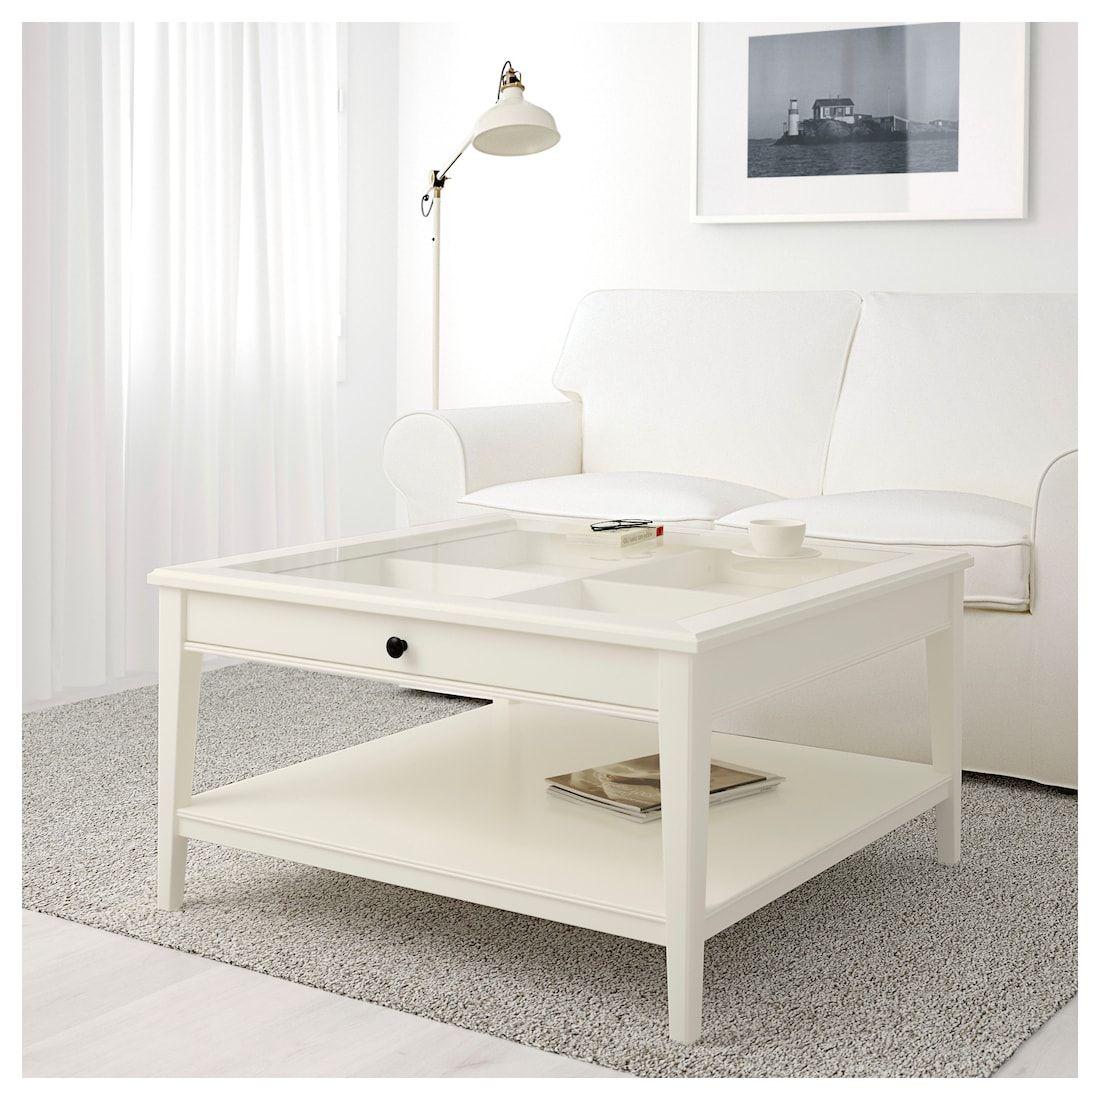 Liatorp Coffee Table White Glass 365 8x365 8 93x93 Cm Ikea In 2021 Ikea Coffee Table White Glass Coffee Table Liatorp [ 1100 x 1100 Pixel ]